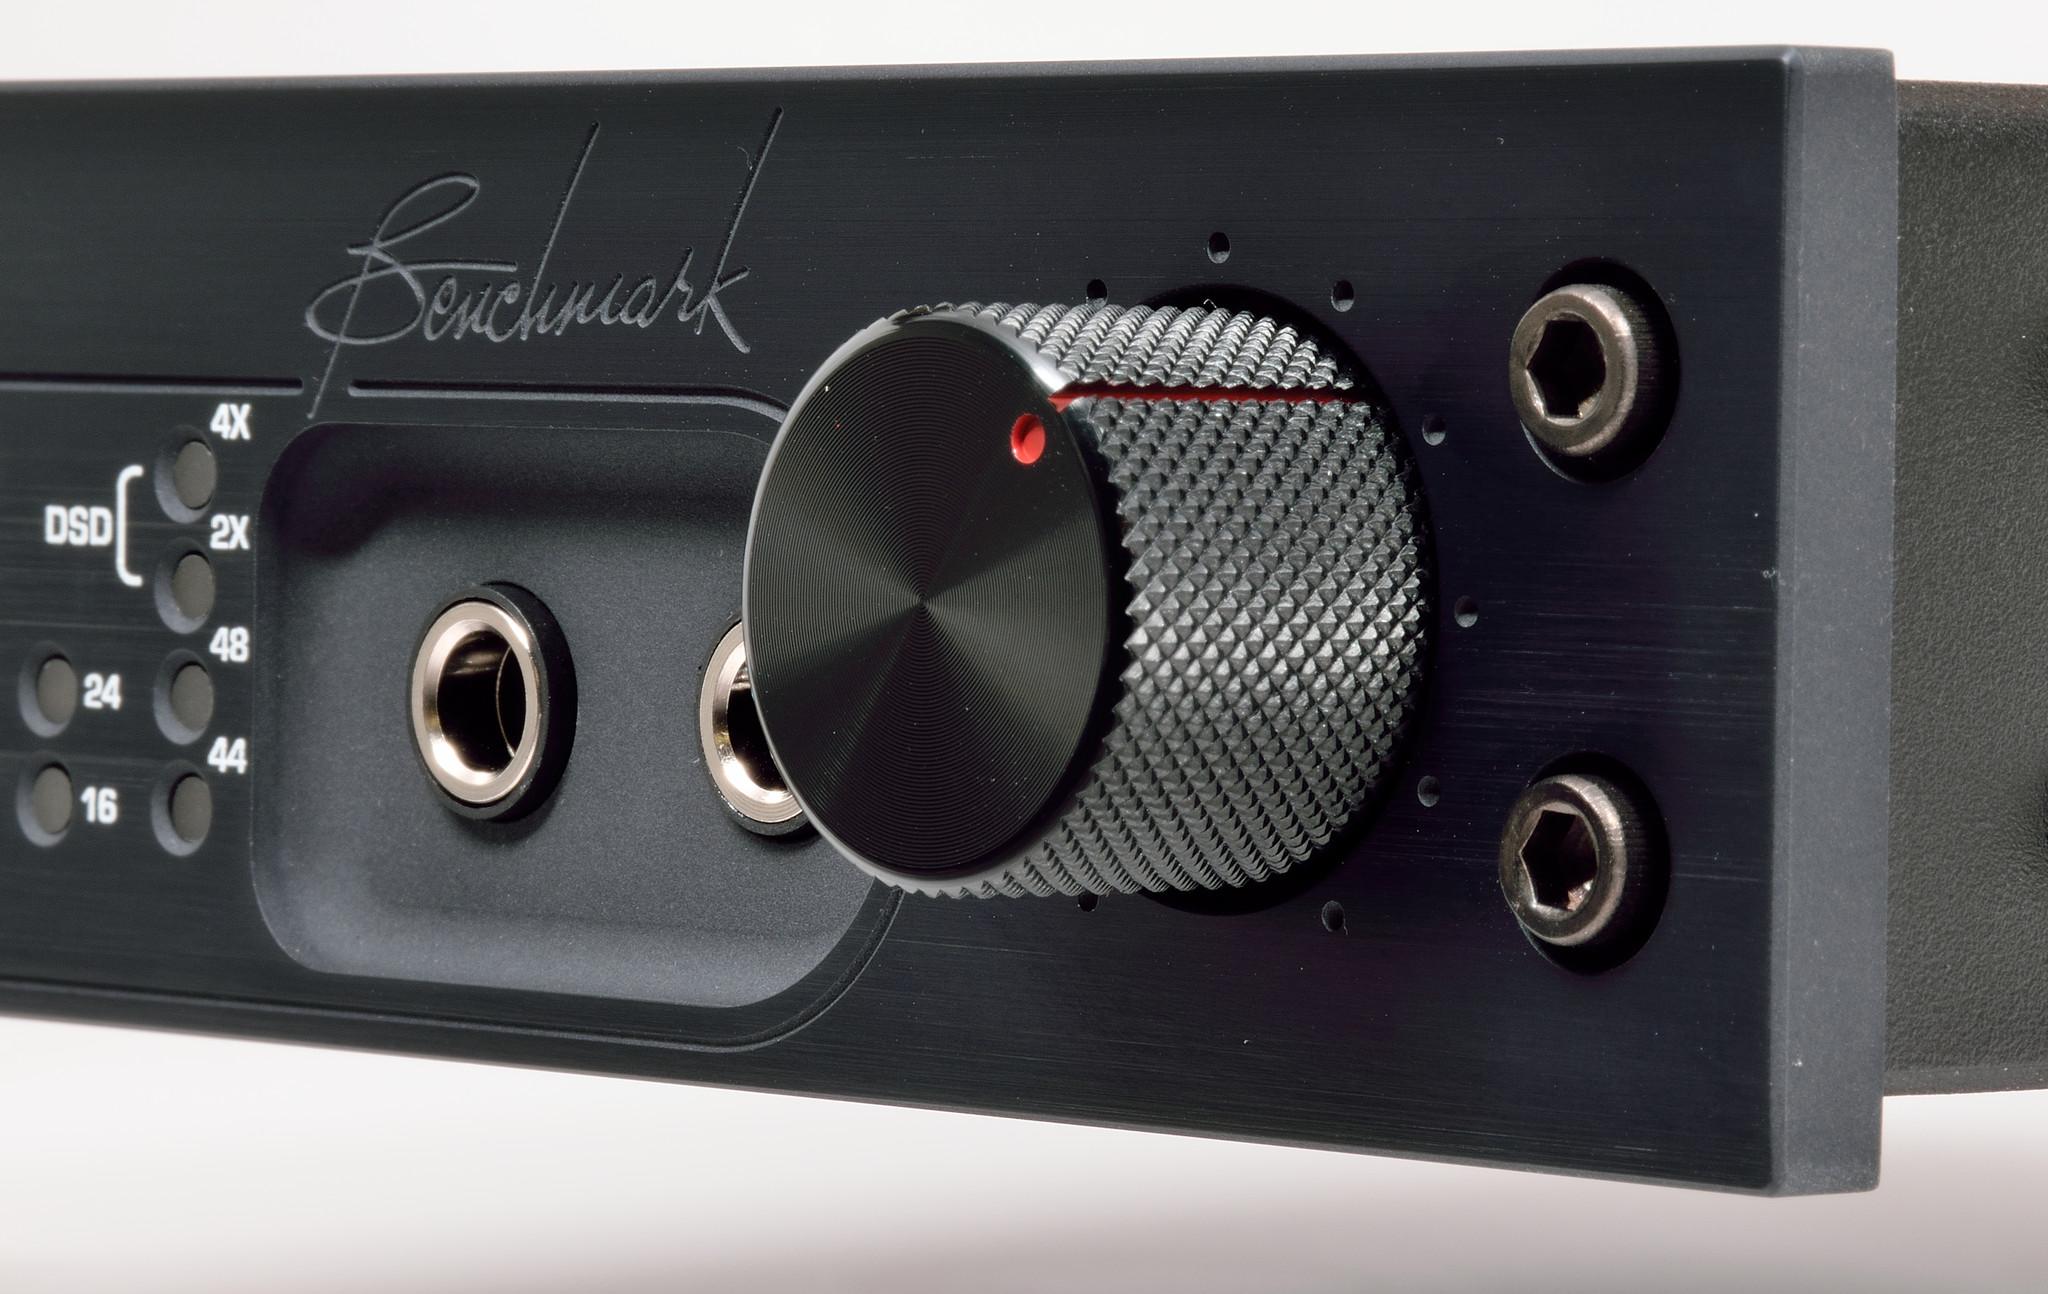 Benchmark DAC2 DX